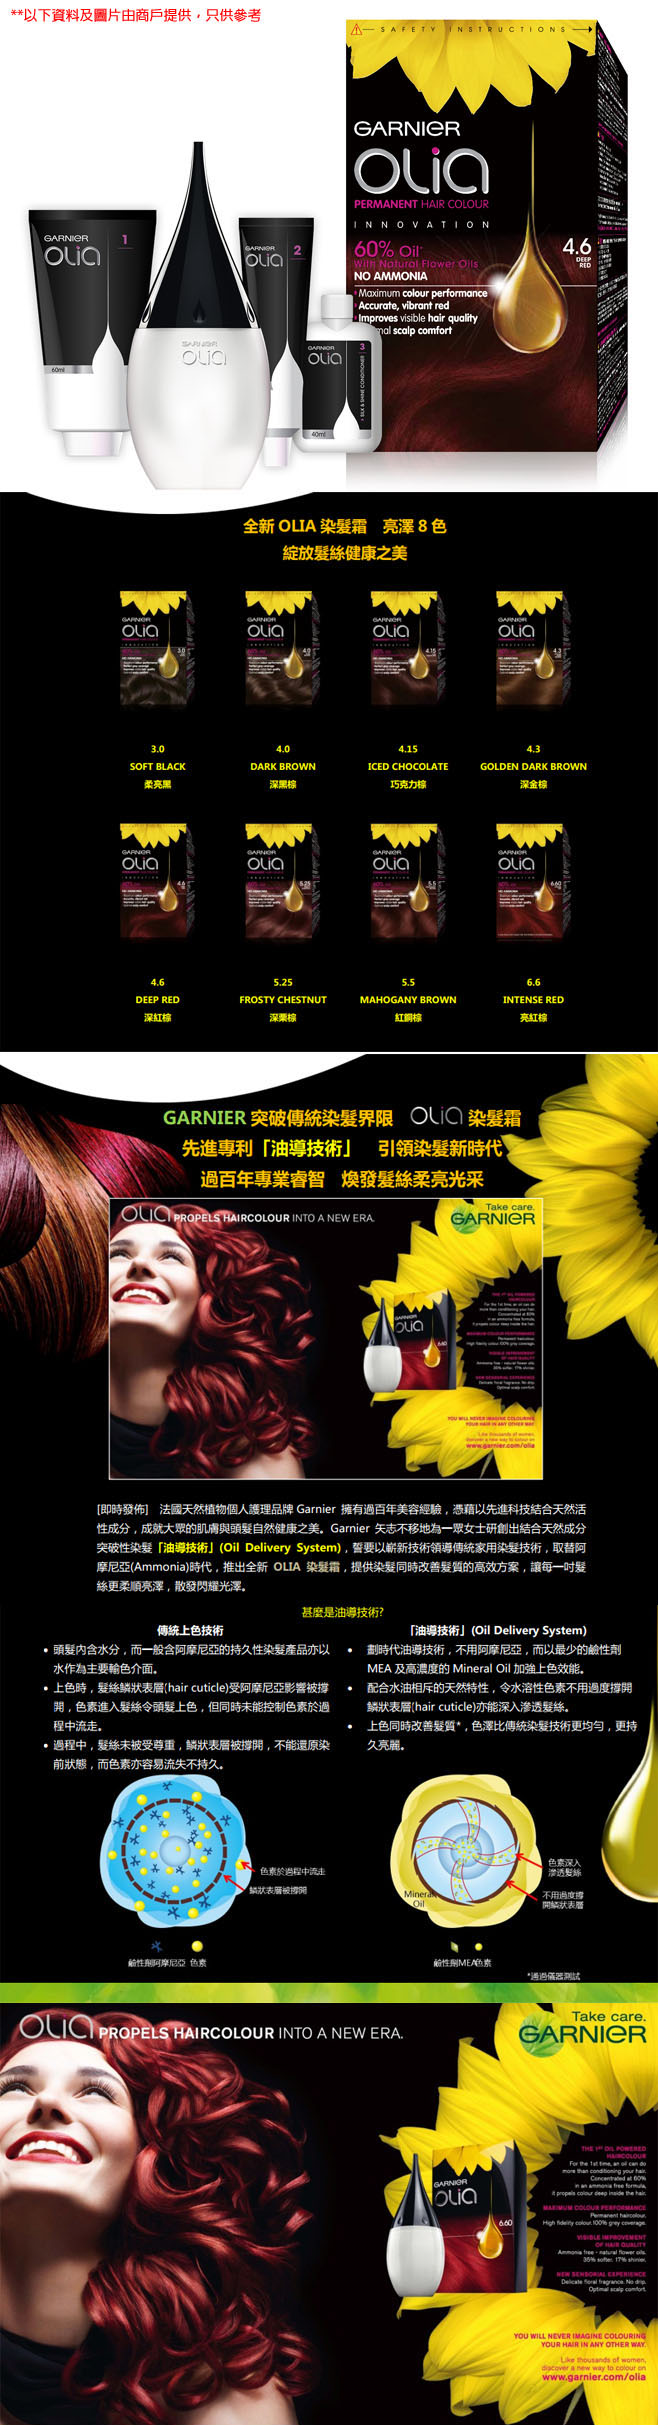 [Pilotage 派樂團購]GARNIER先進專利「油導技術」OLIA 染髮霜